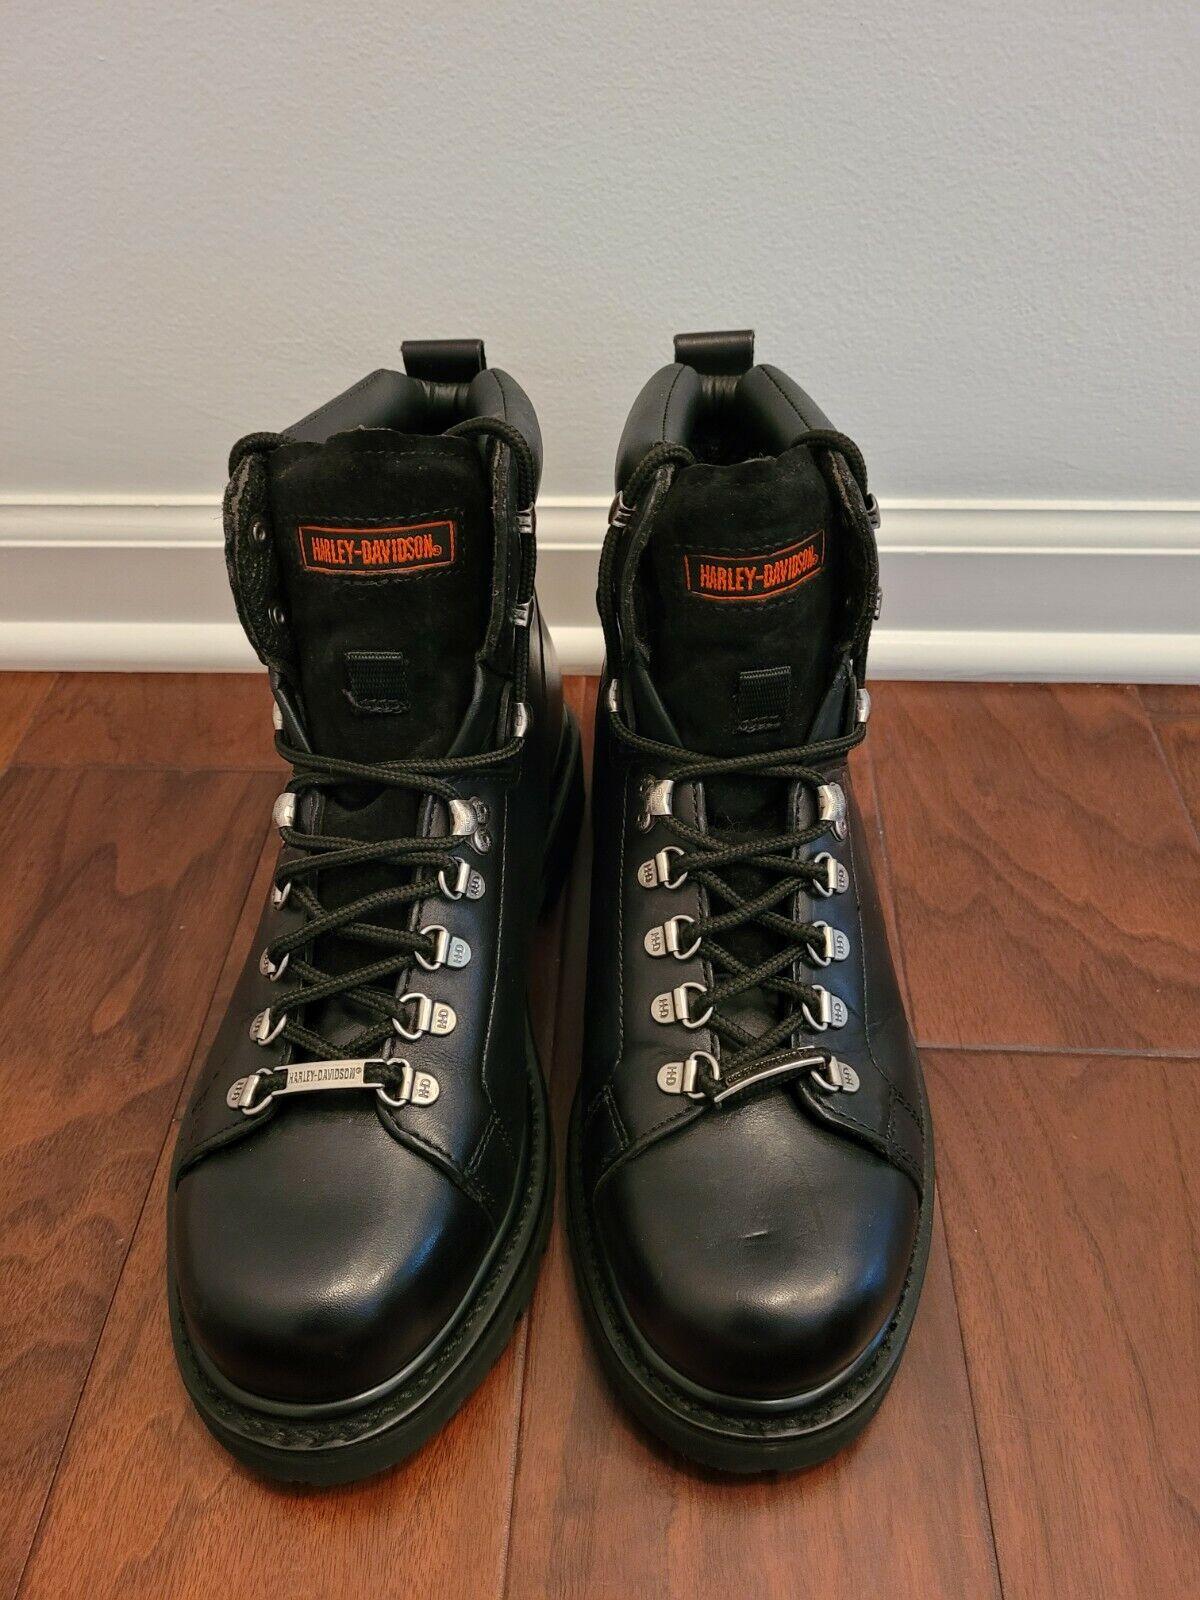 Harley-Davidson Dipstick Steel Toe Motorcycle Boots, Black L